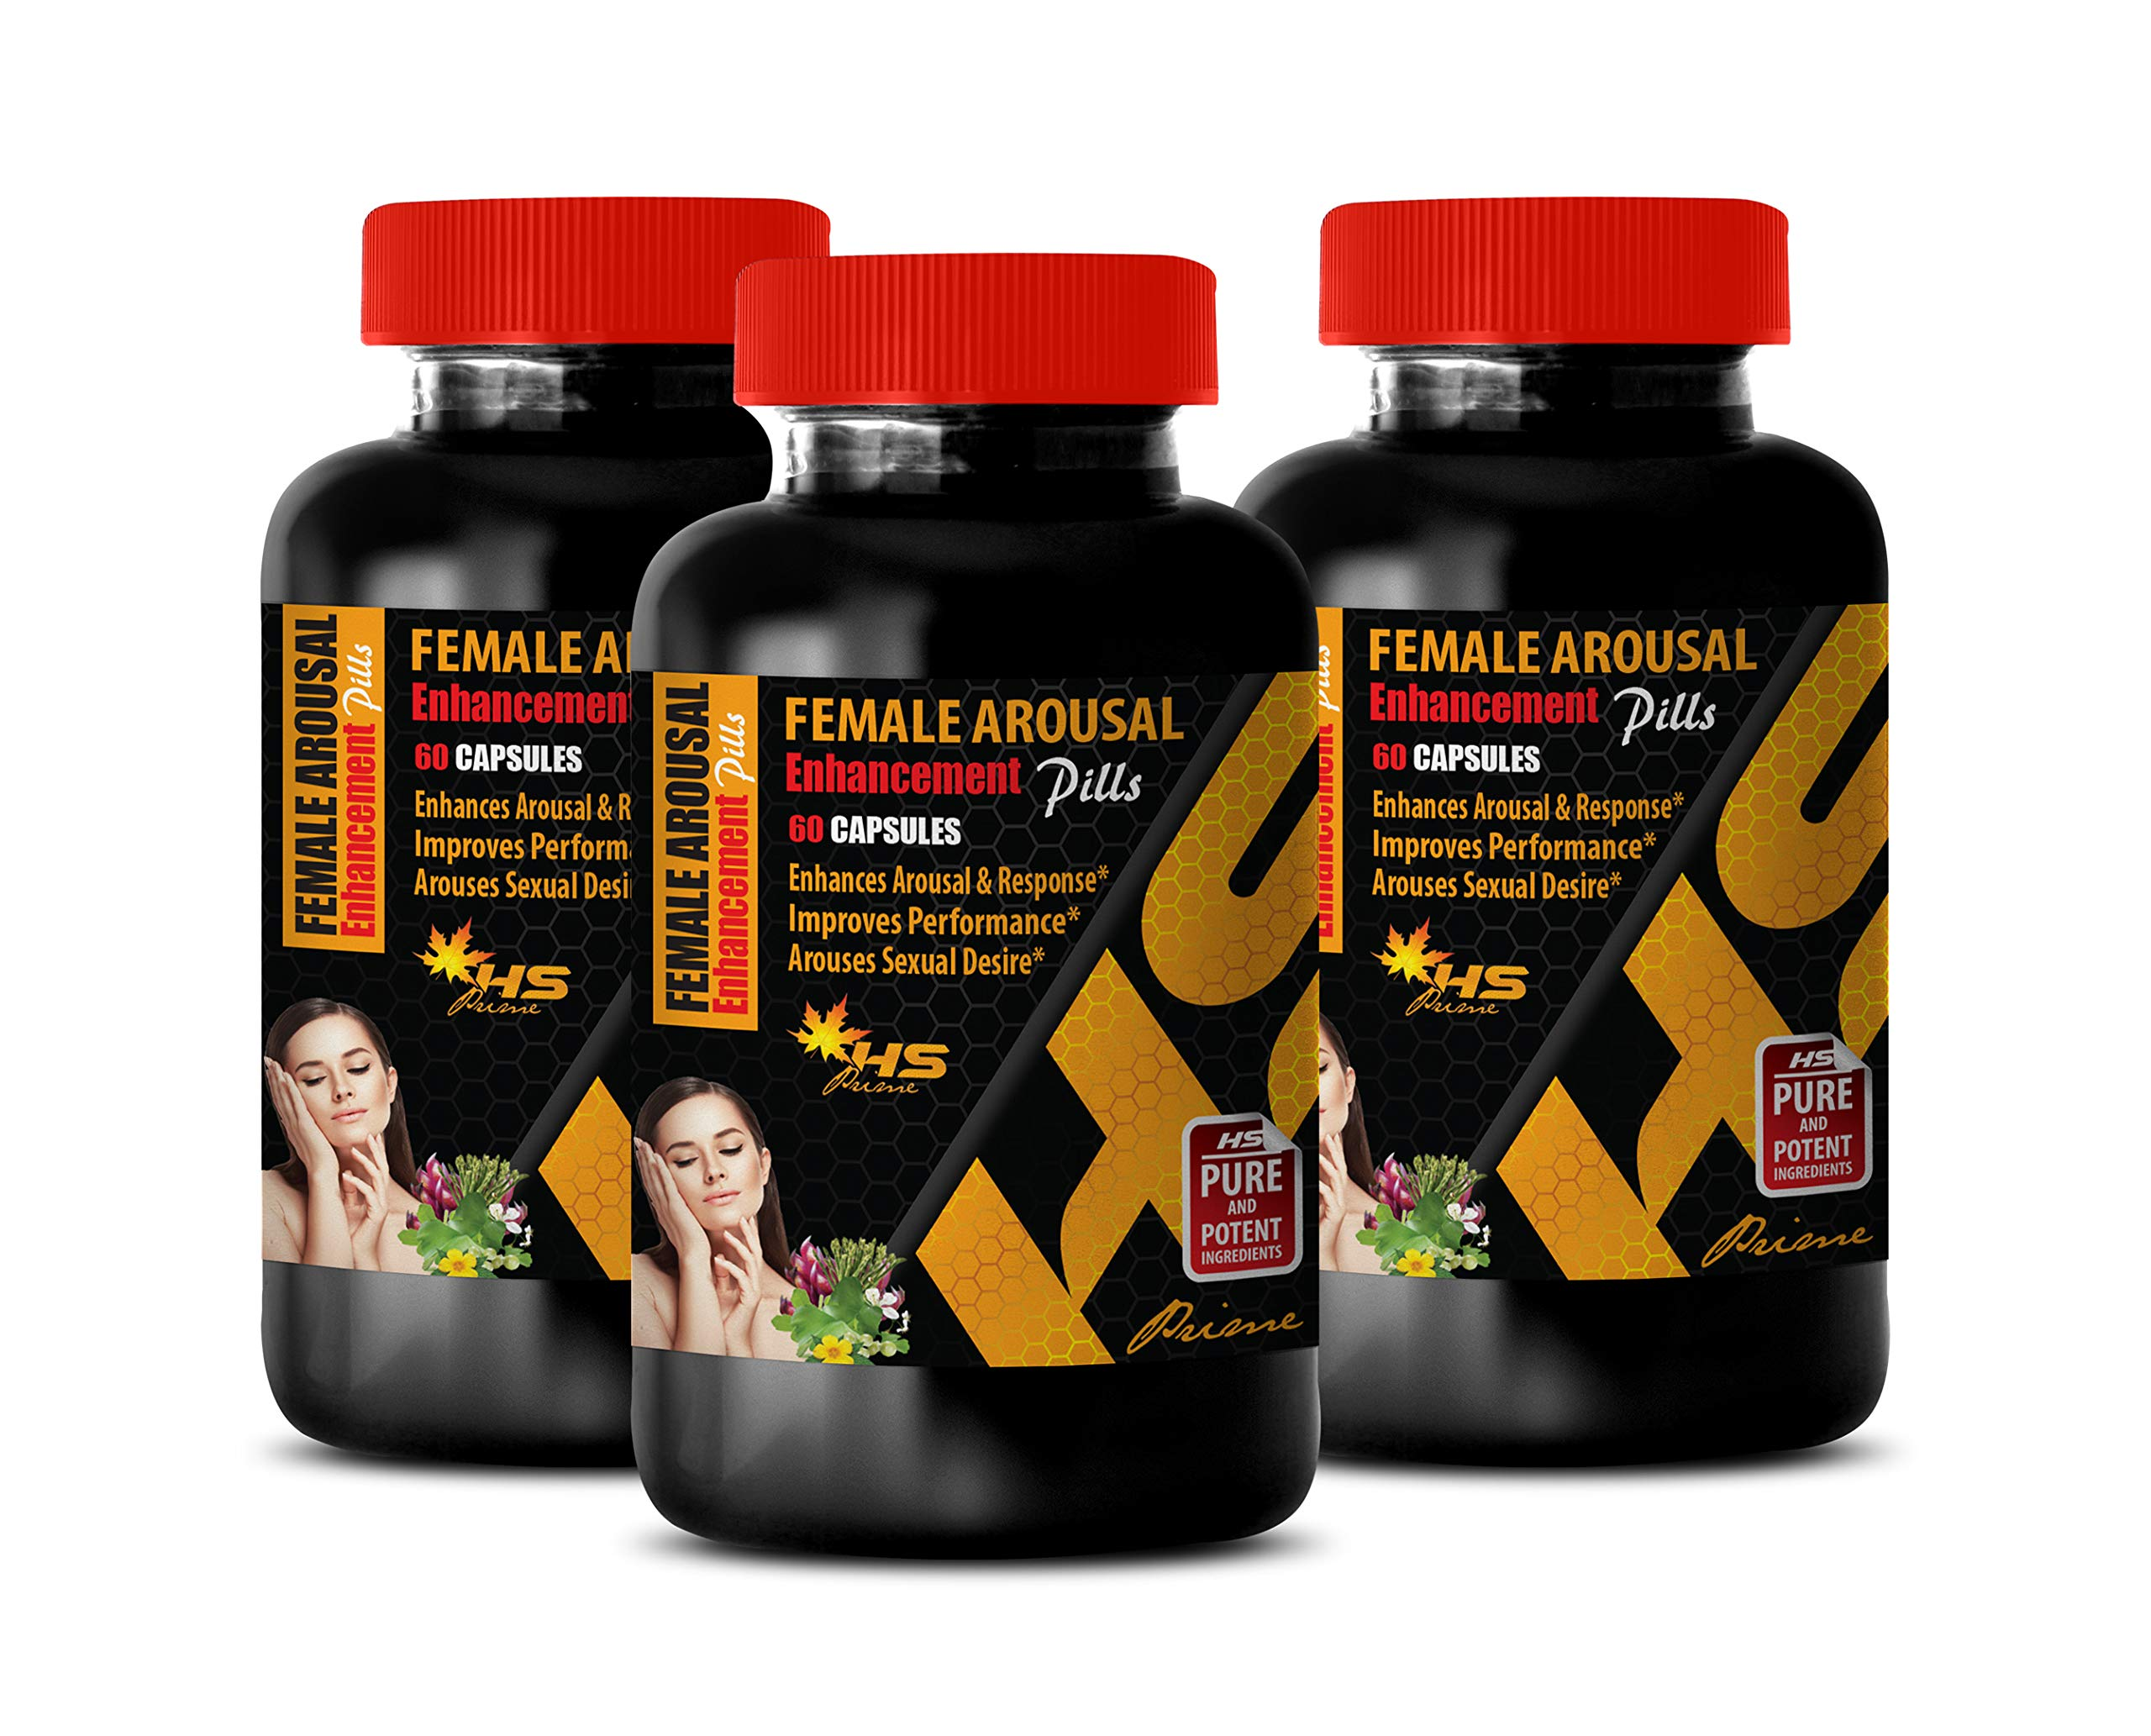 Steel libido for Women - Female Arousal Enhancement Pills - AROUSES Sexual Desire - mucuna pruriens Velvet Bean - 3 Bottles 180 Capsules